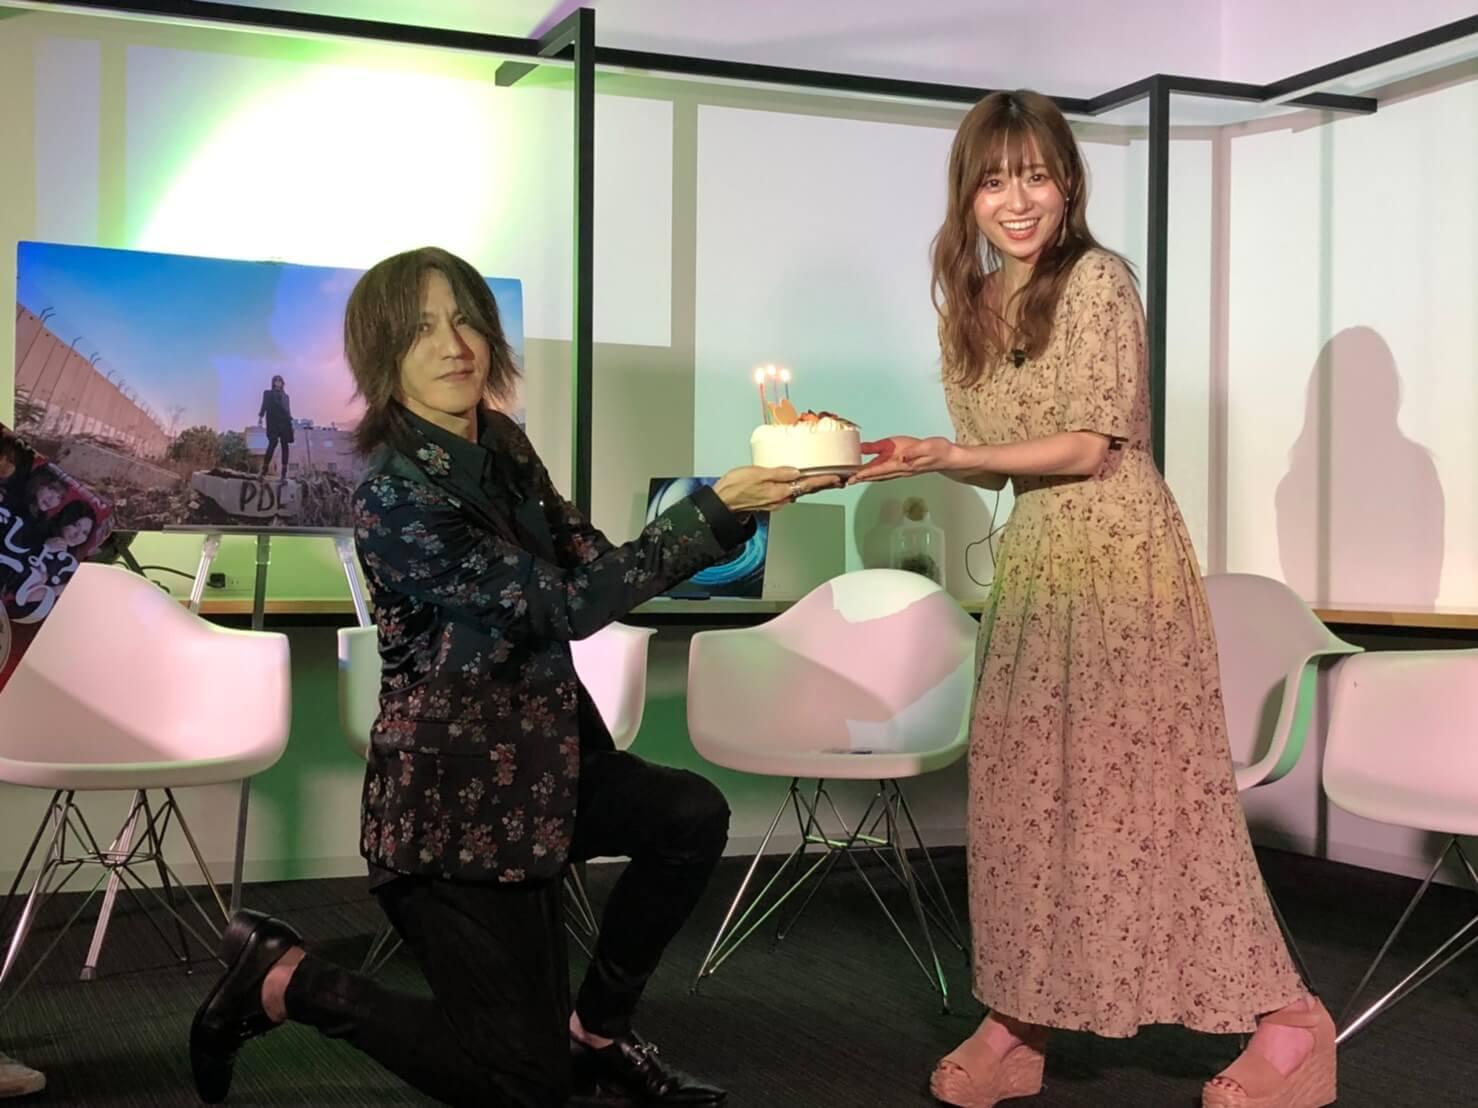 SILENT SIREN、LUNA SEA/X JAPANのSUGIZOとSugizoTubeで初共演&ゆかるんがSUGIZOからサプライズバースデーでお祝い